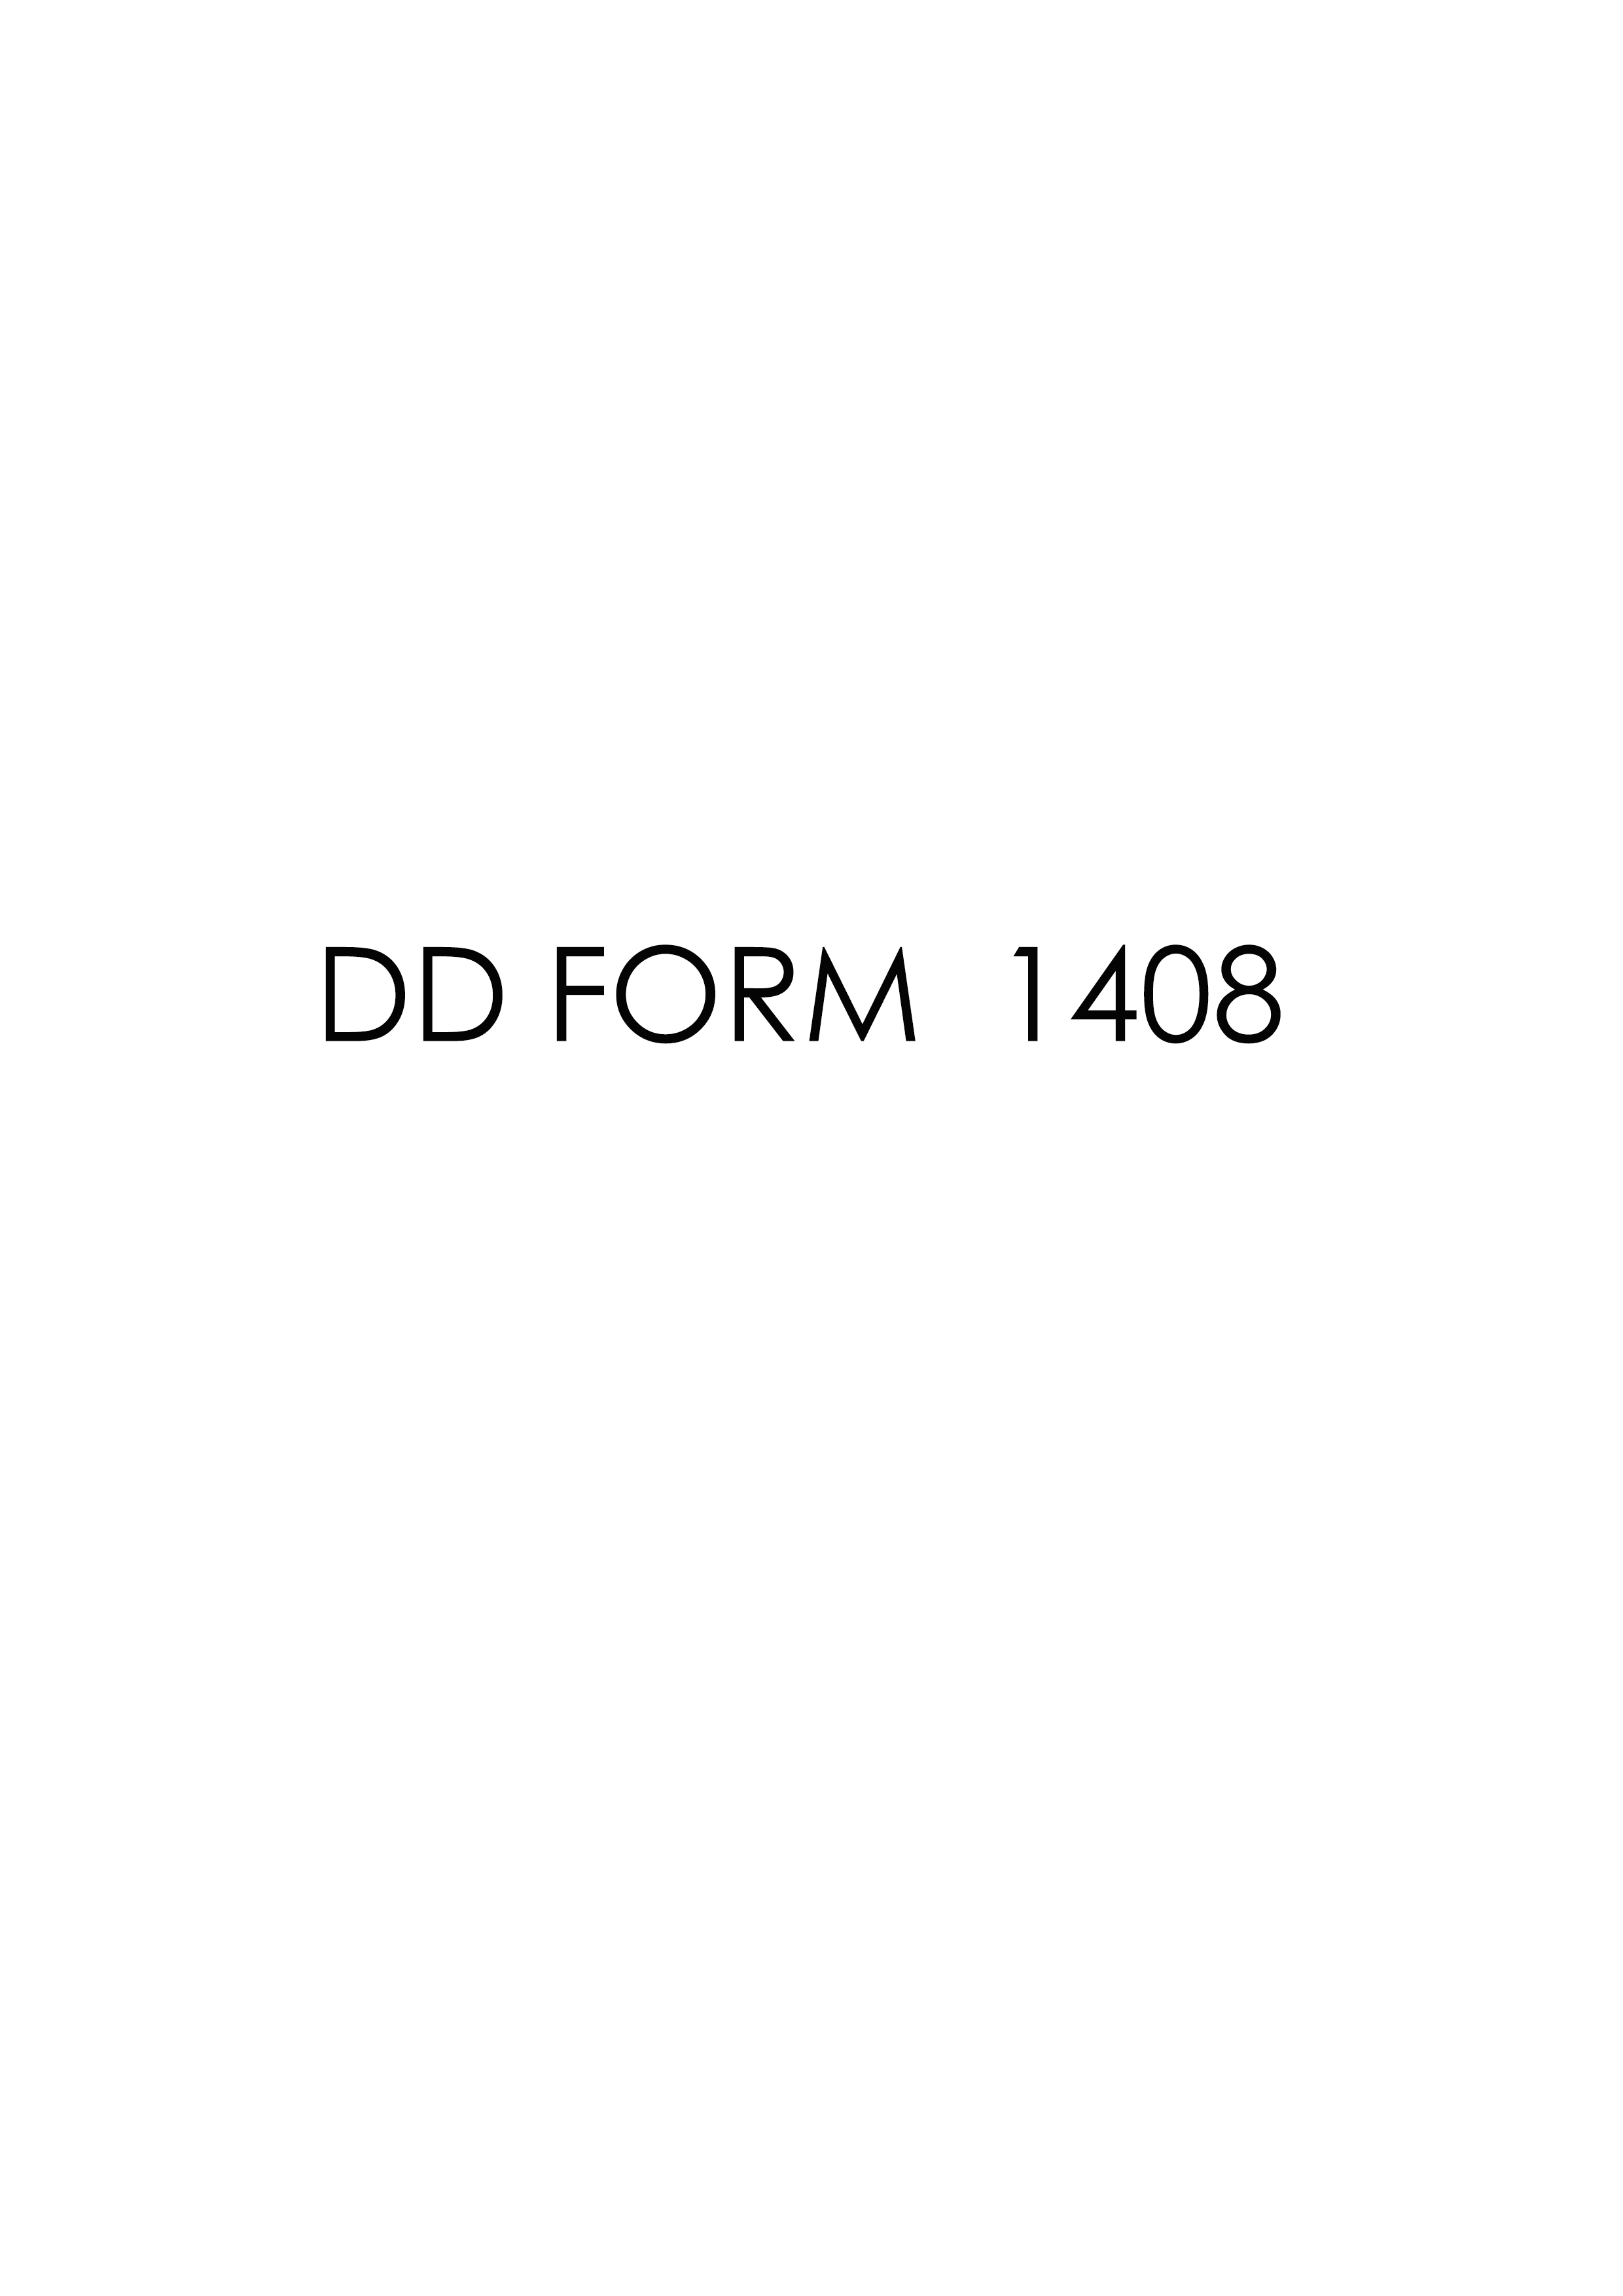 Download dd Form 1408 Free